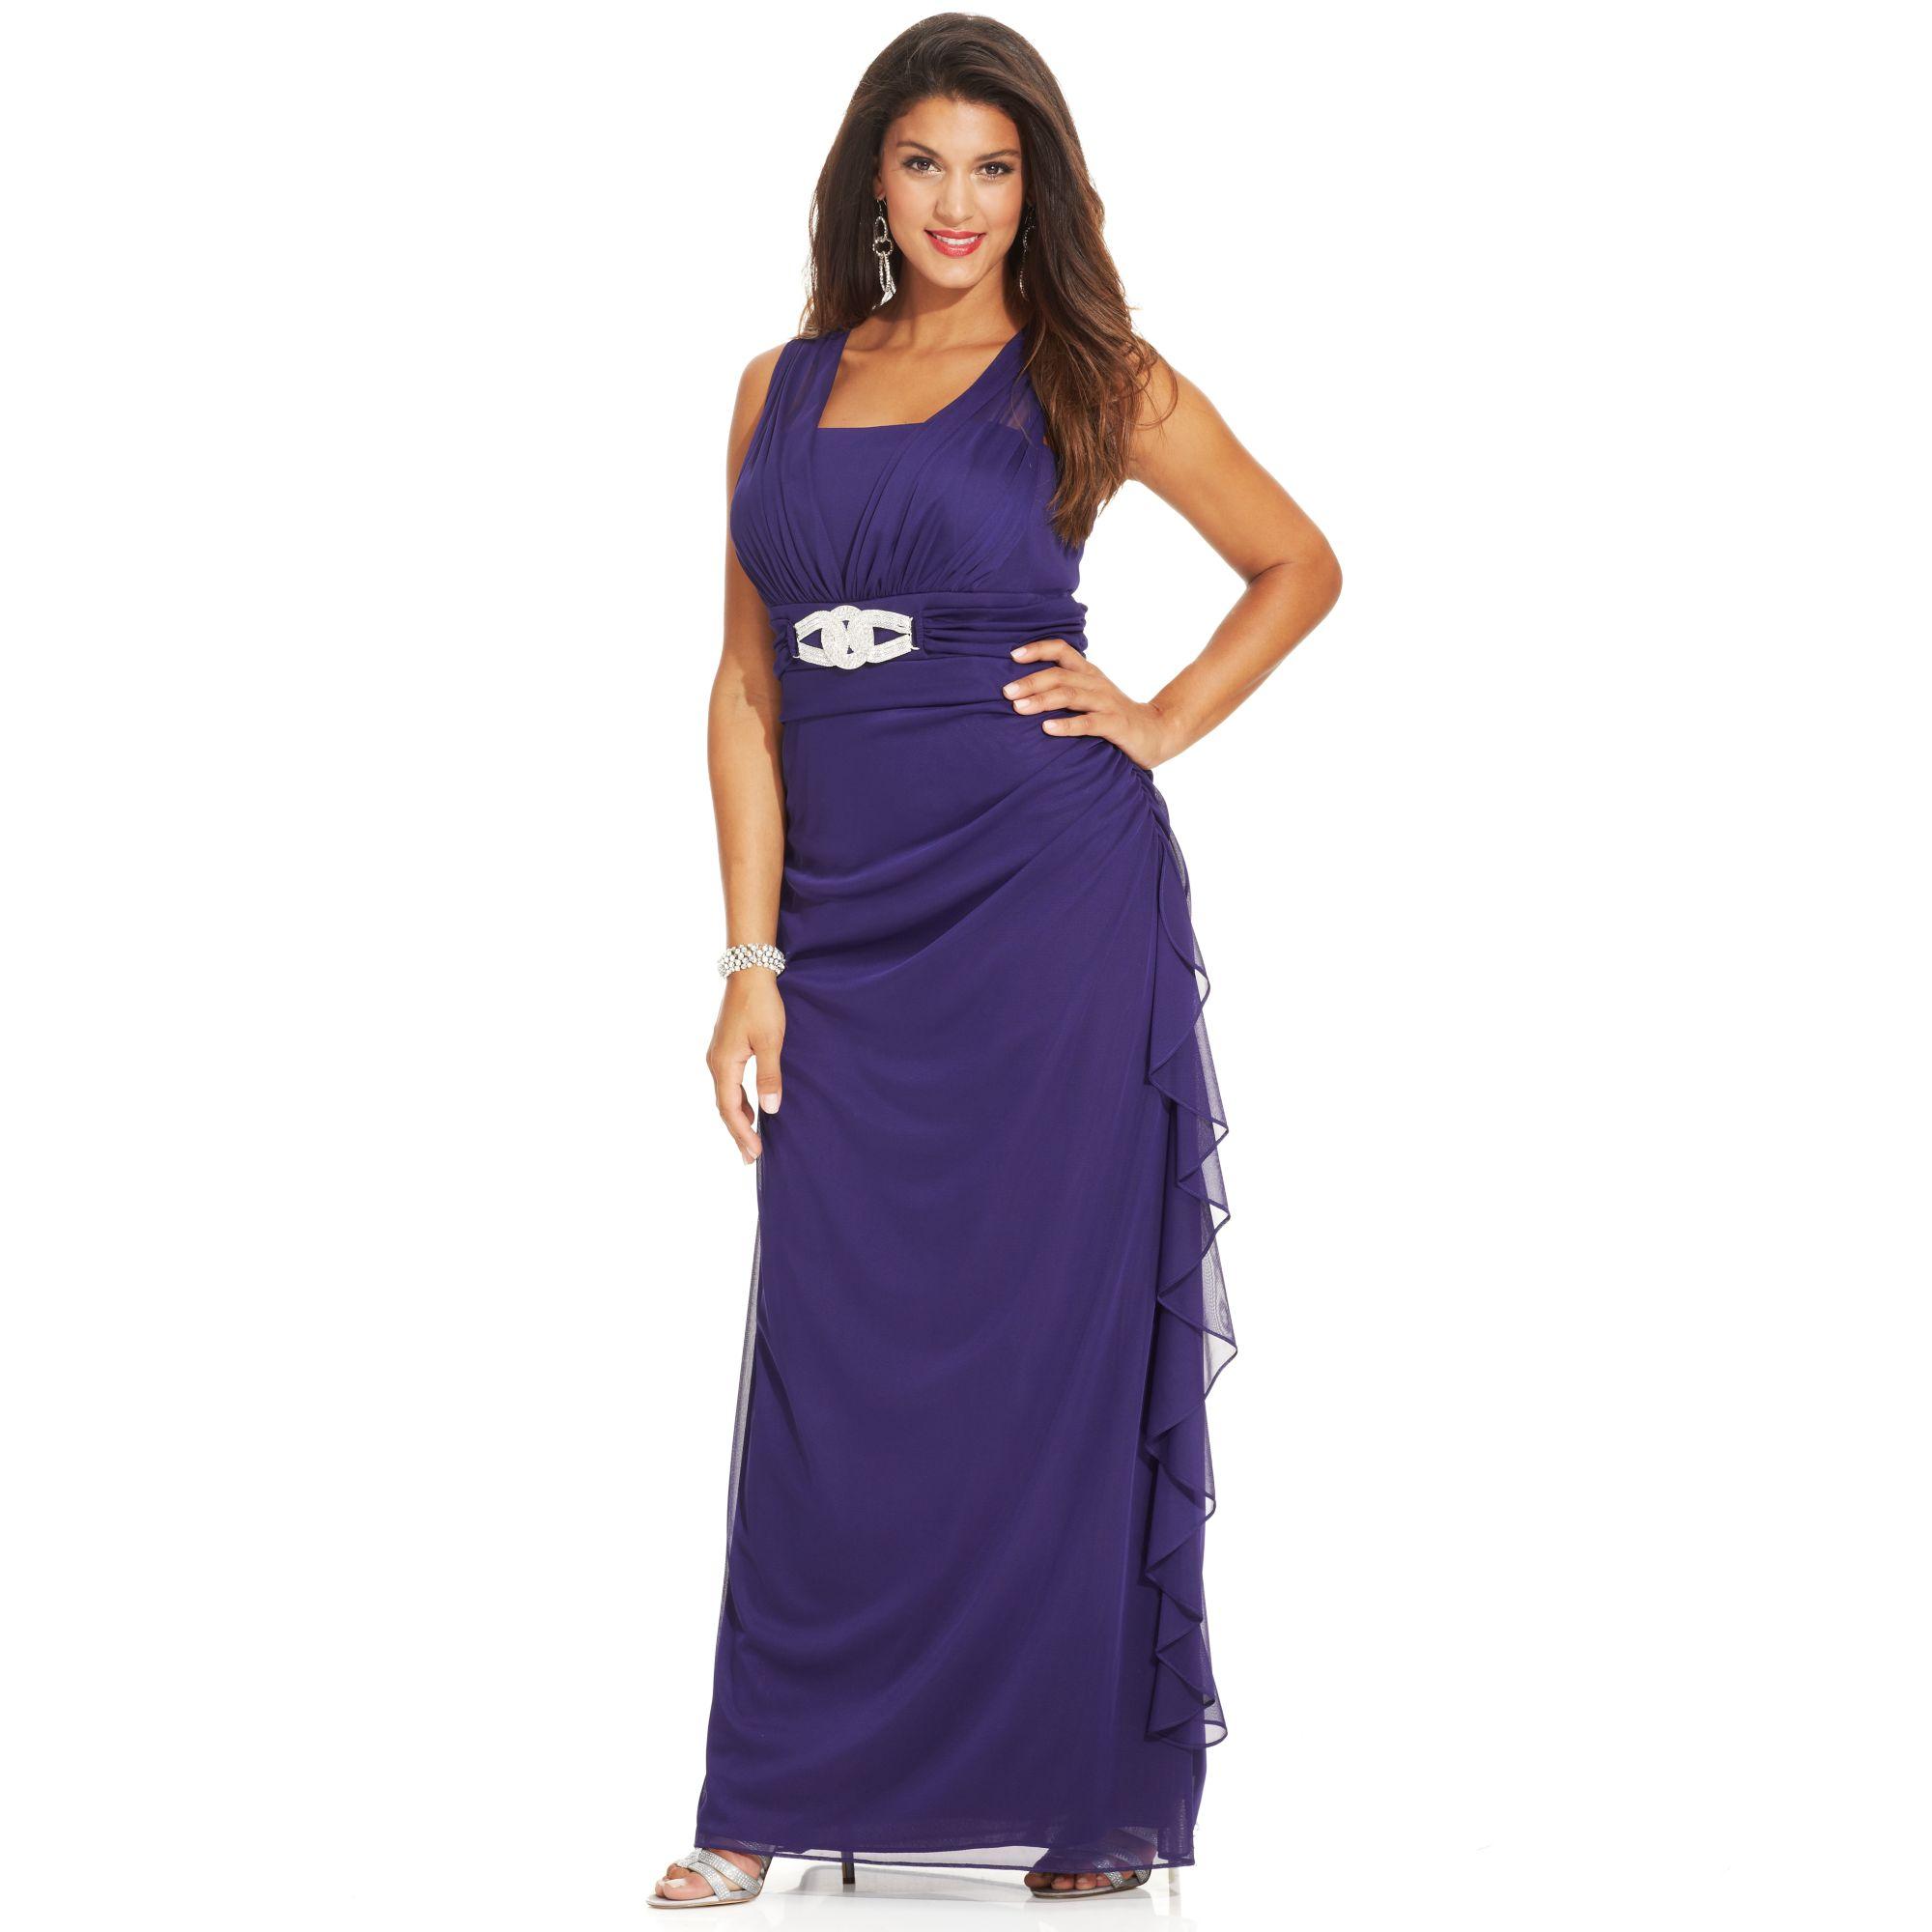 Betsy adam purple chiffon evening dress